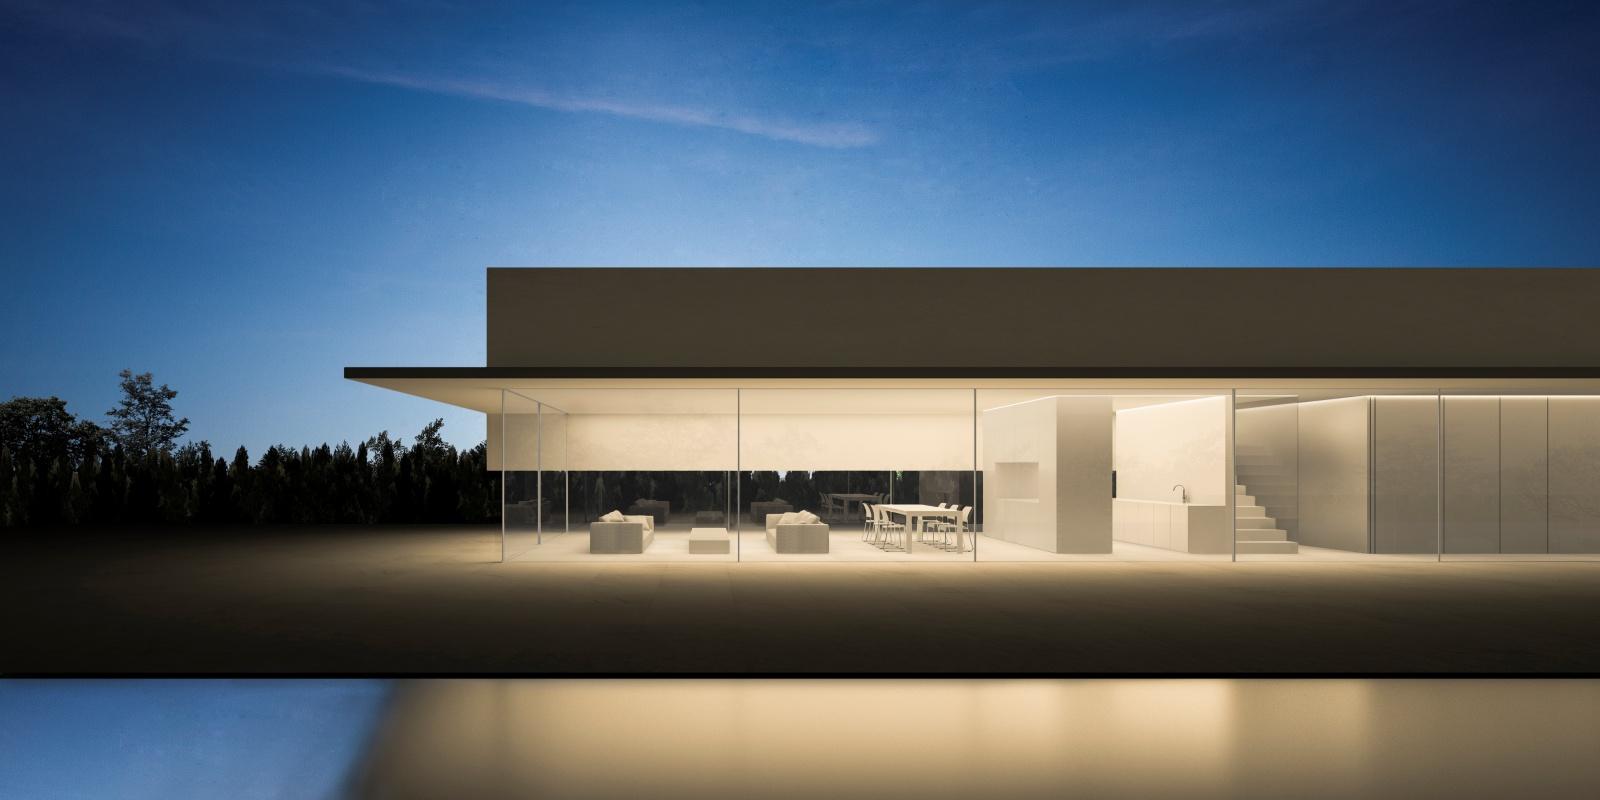 Hofmann house rocafort by fran silvestre arquitectos 03 - Fran silvestre arquitectos ...